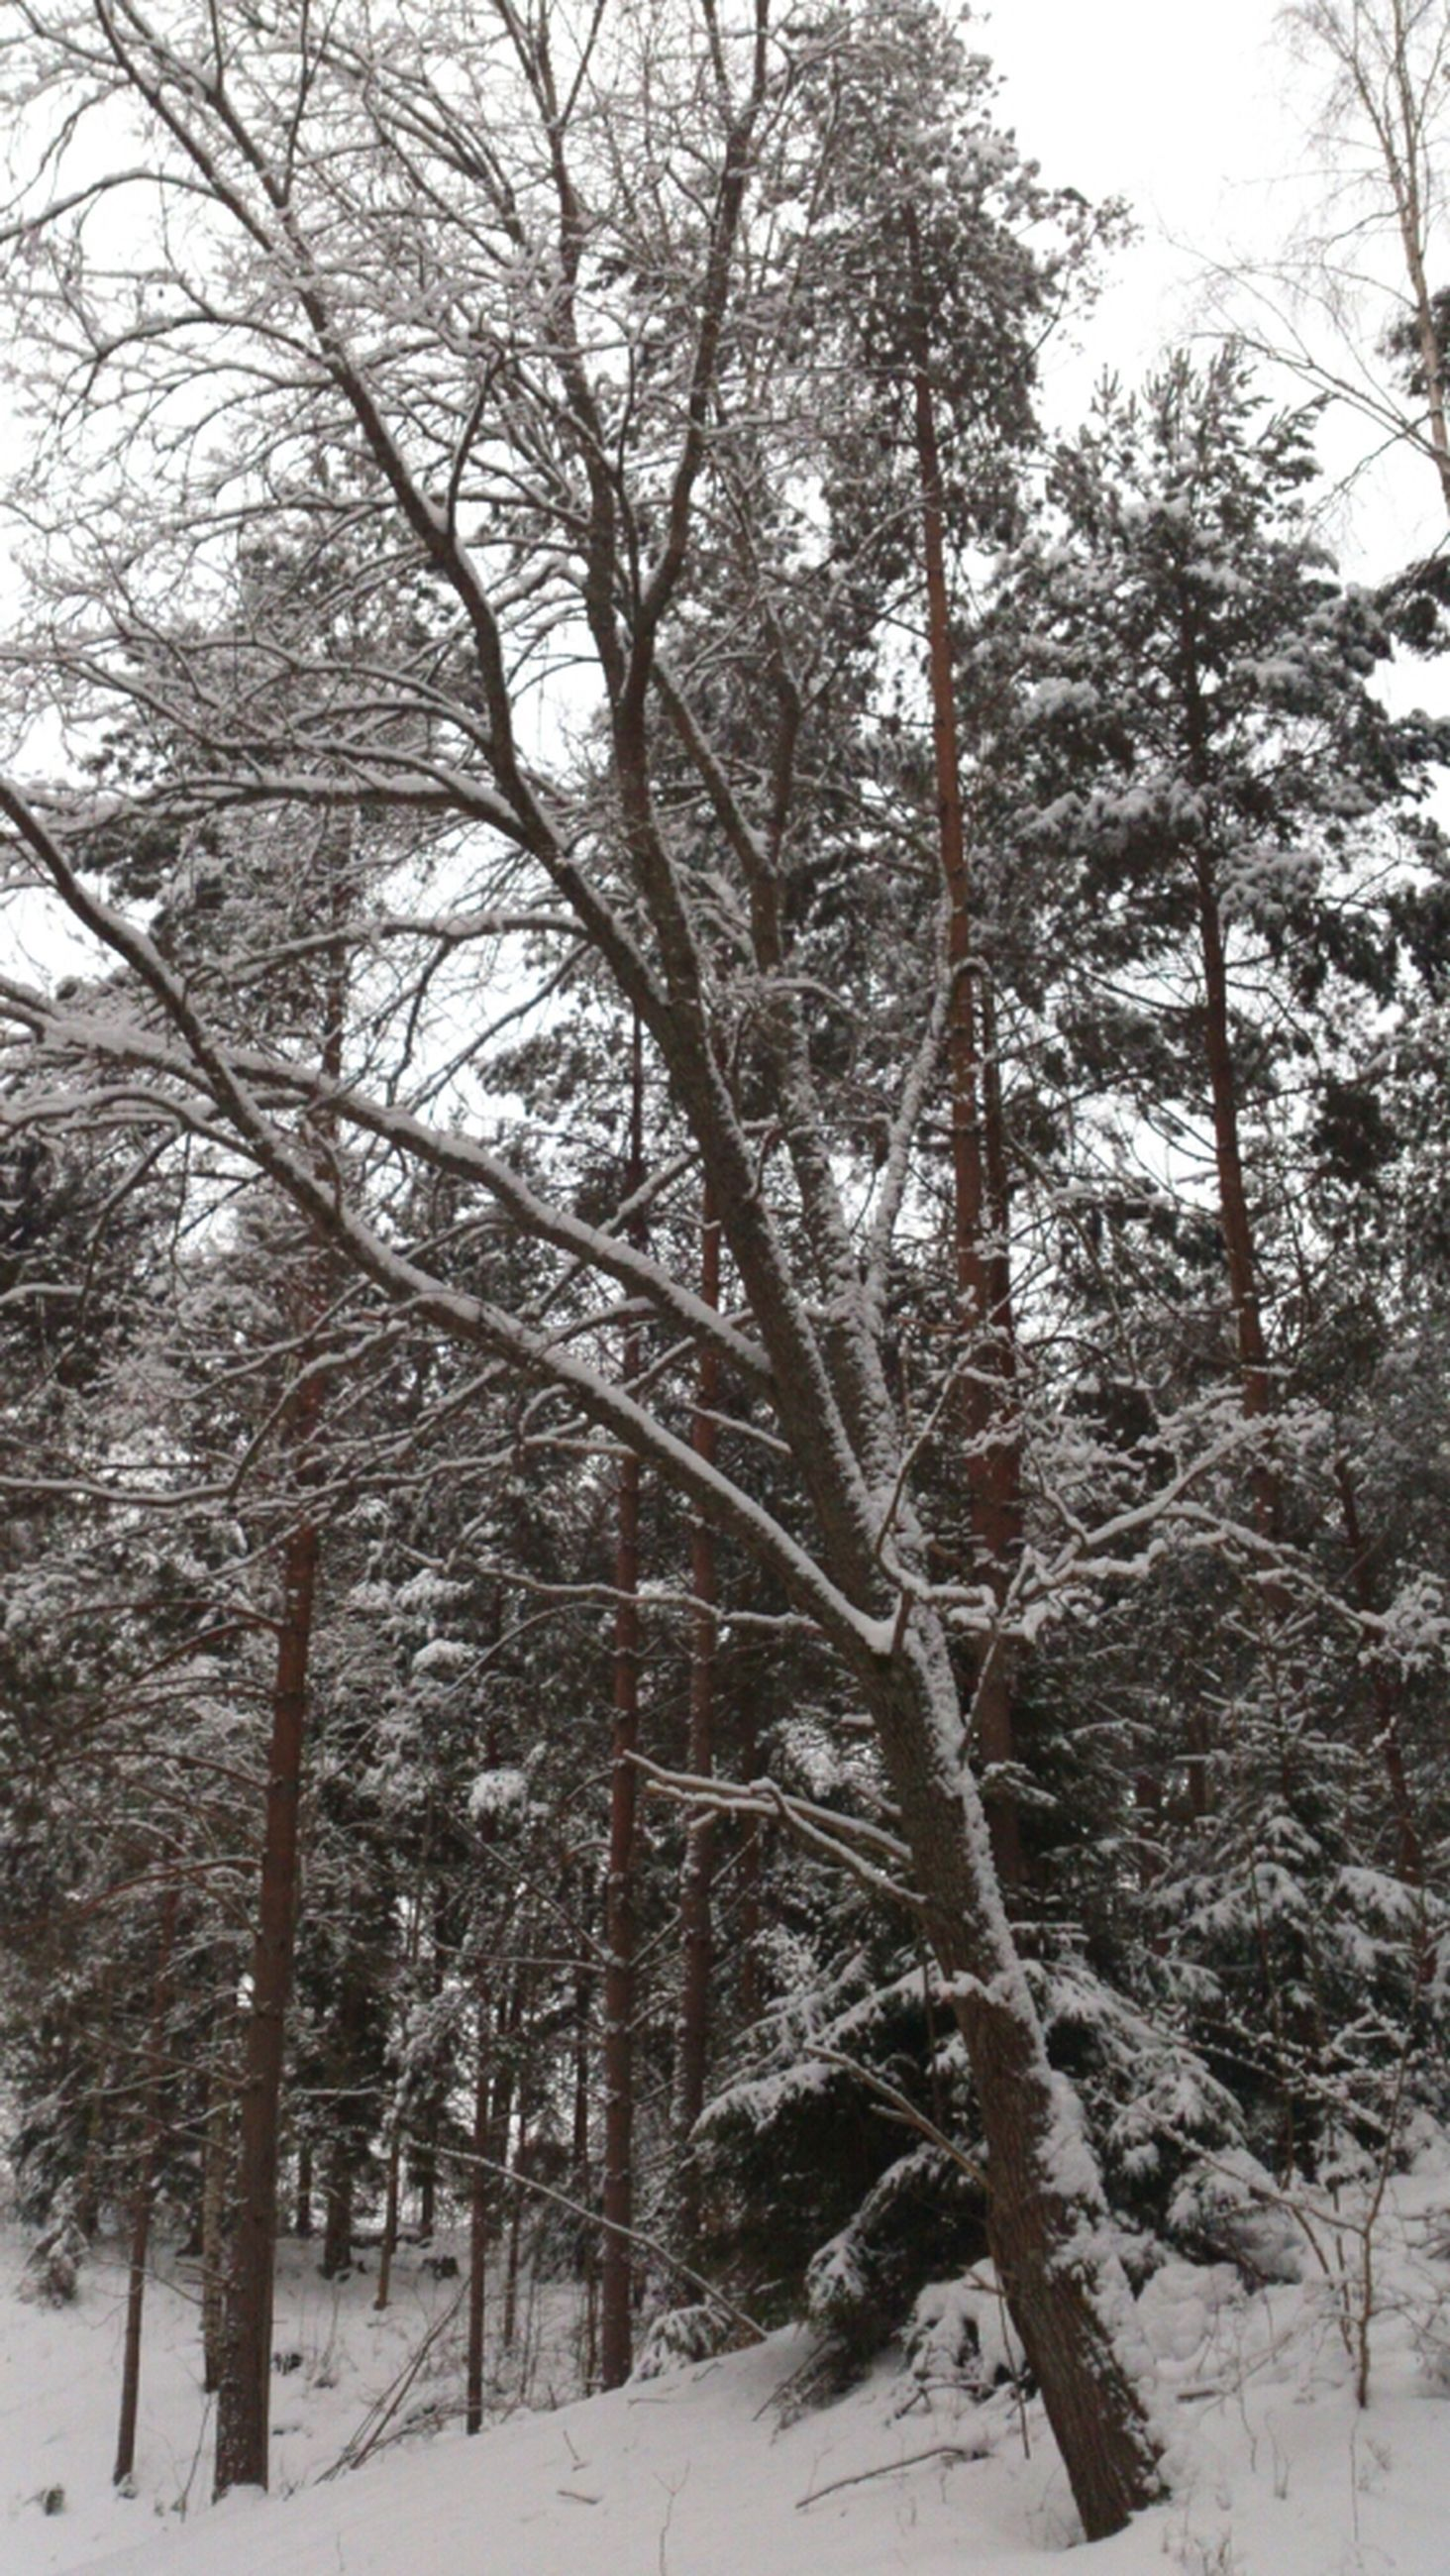 snow, winter, cold temperature, tree, season, weather, covering, bare tree, tranquility, tranquil scene, nature, frozen, beauty in nature, branch, white color, scenics, forest, landscape, covered, non-urban scene